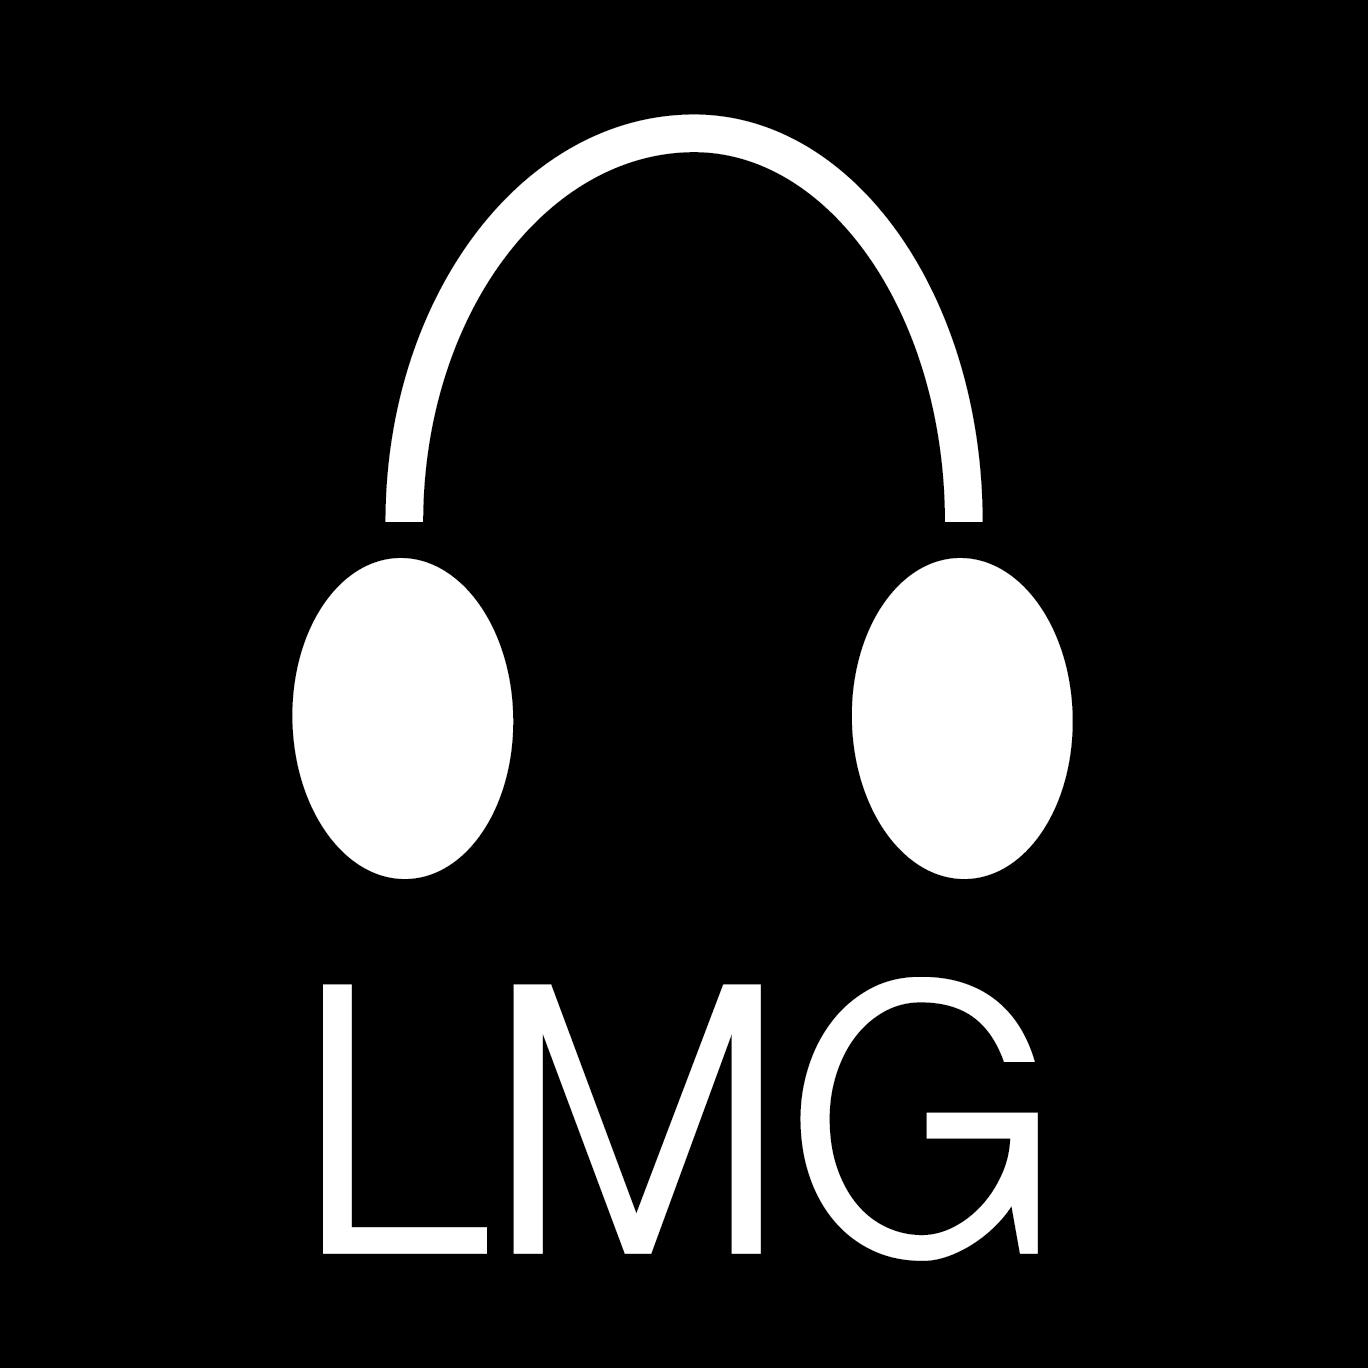 La musica de George LMG